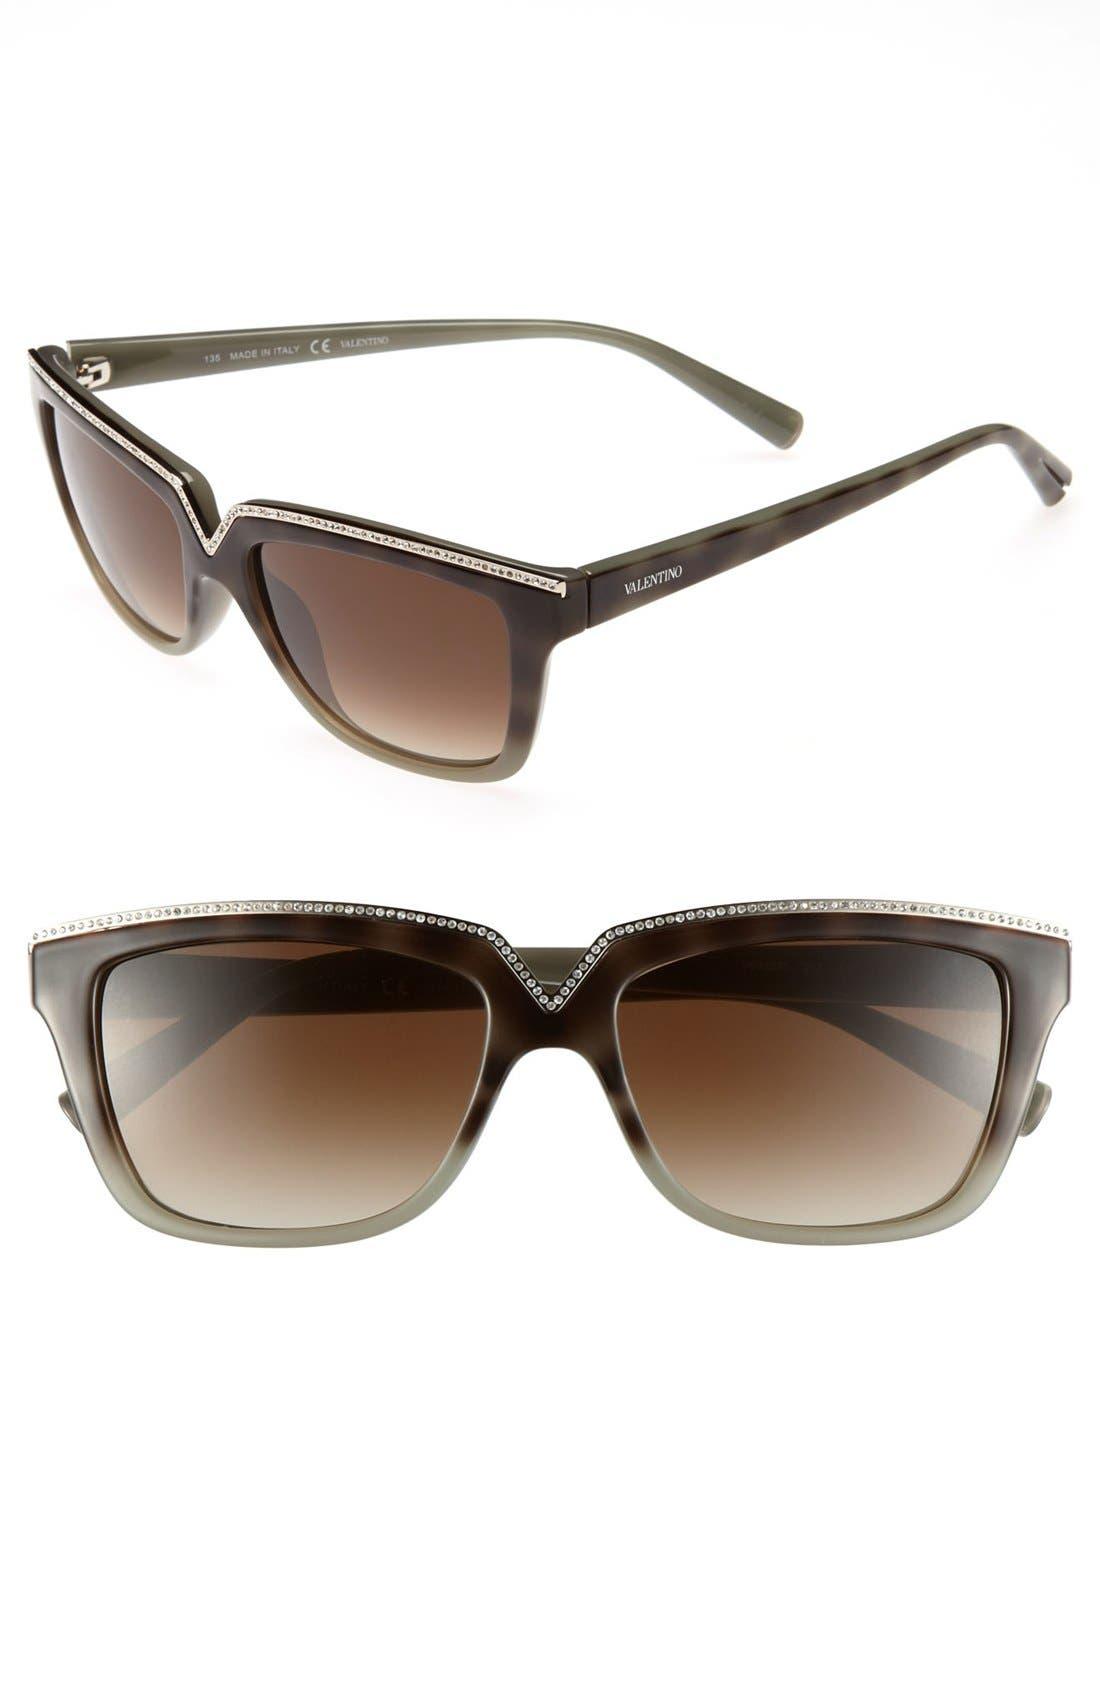 Main Image - Valentino 53mm Retro Sunglasses